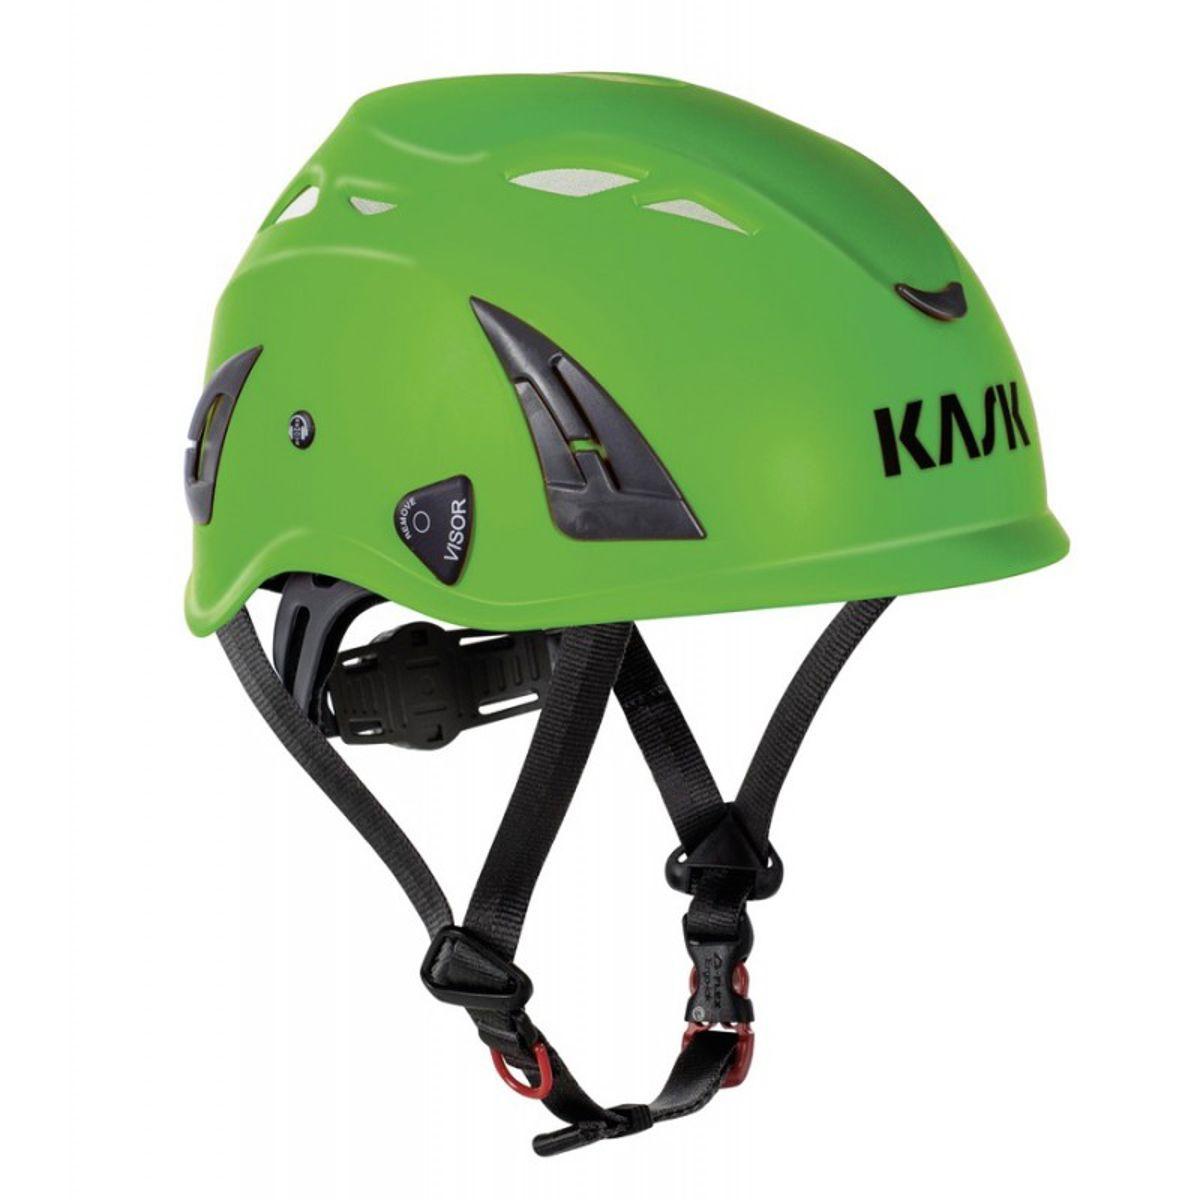 Kask helm plasma aq - lichtgroen - en397